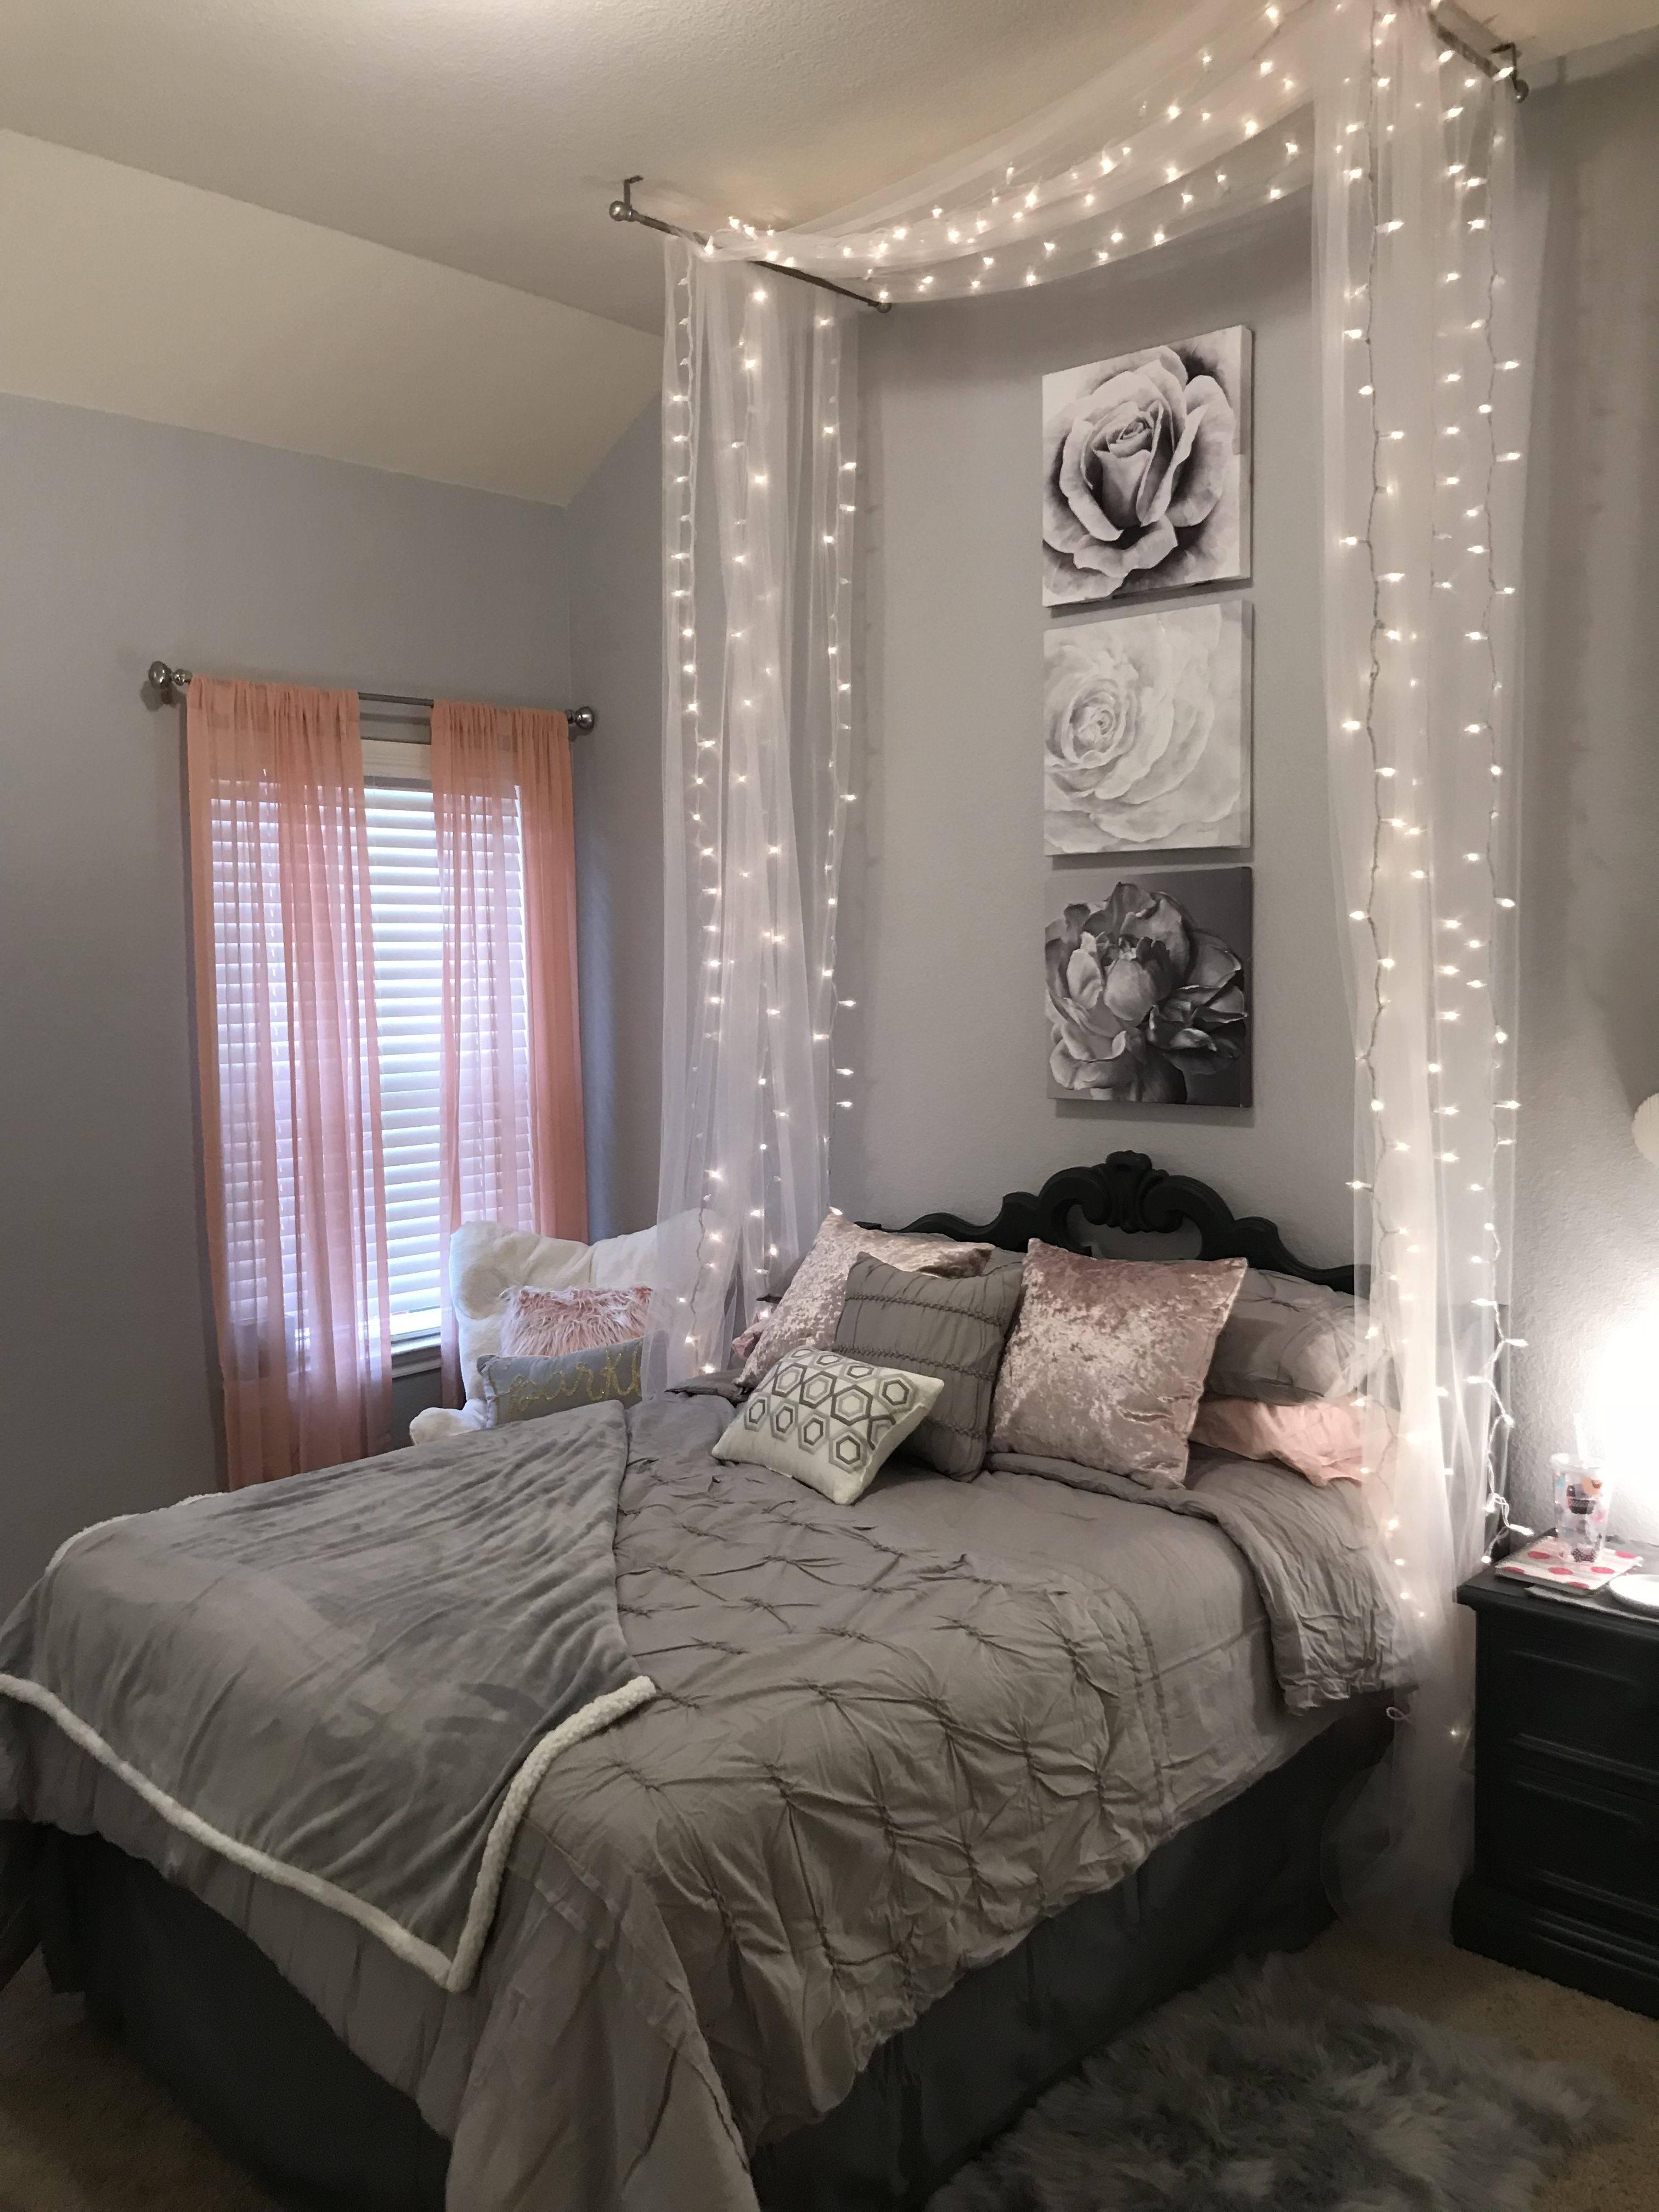 teenage girl bedroom ideas cheap awesome 30 bedroom ideas for teenage girls jcelectricalcontractors of teenage girl bedroom ideas cheap